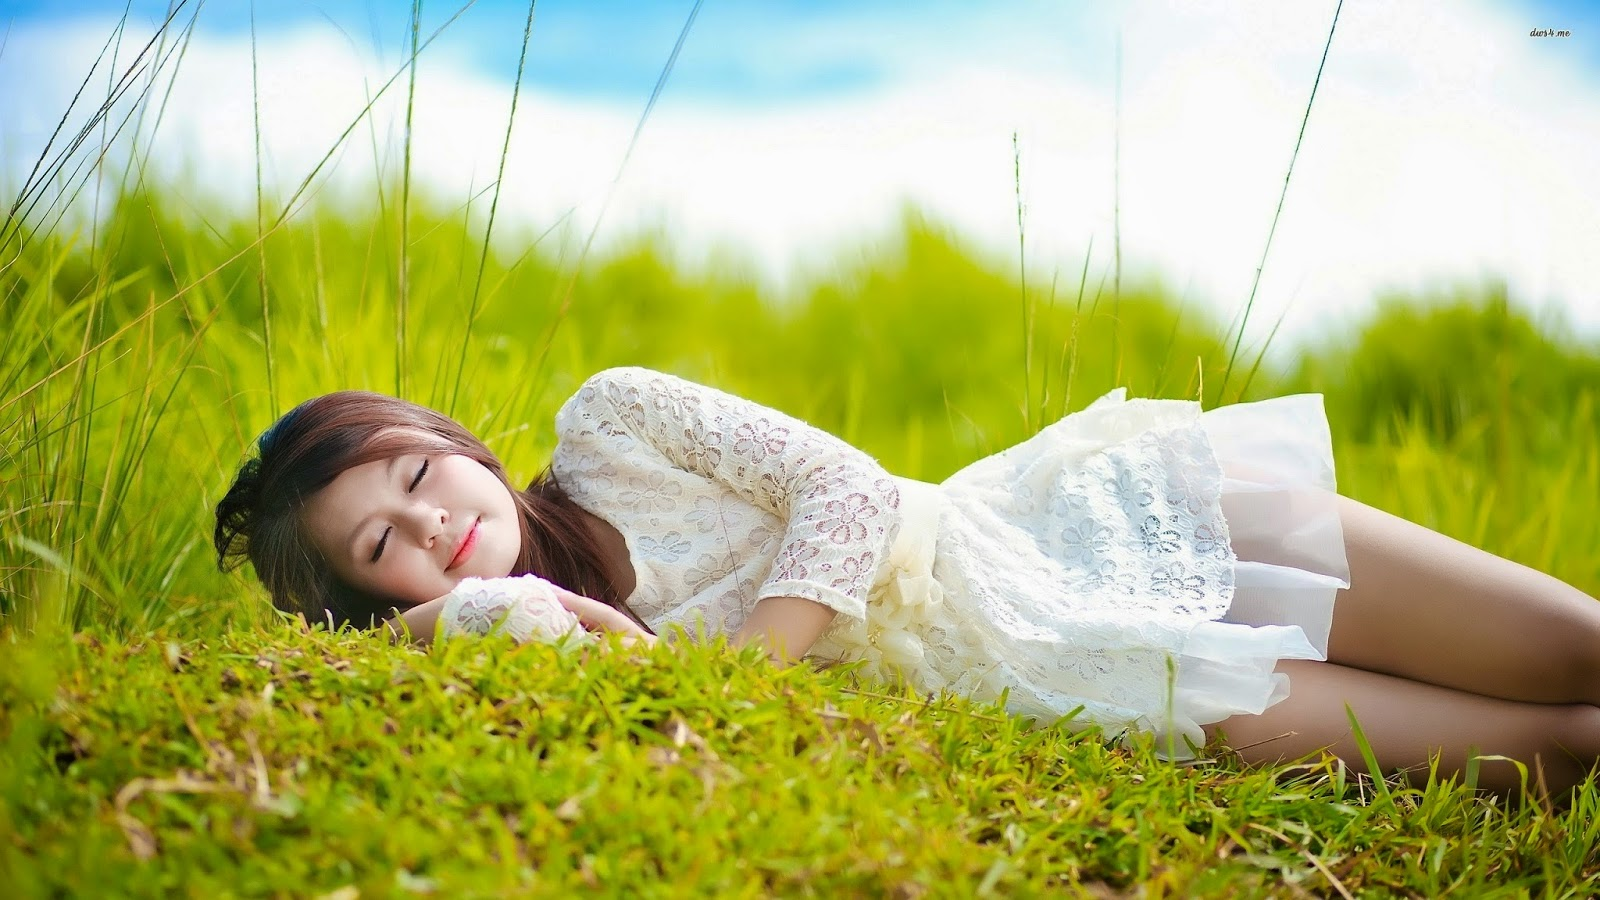 Cute Girl in The Grass Wallpaper